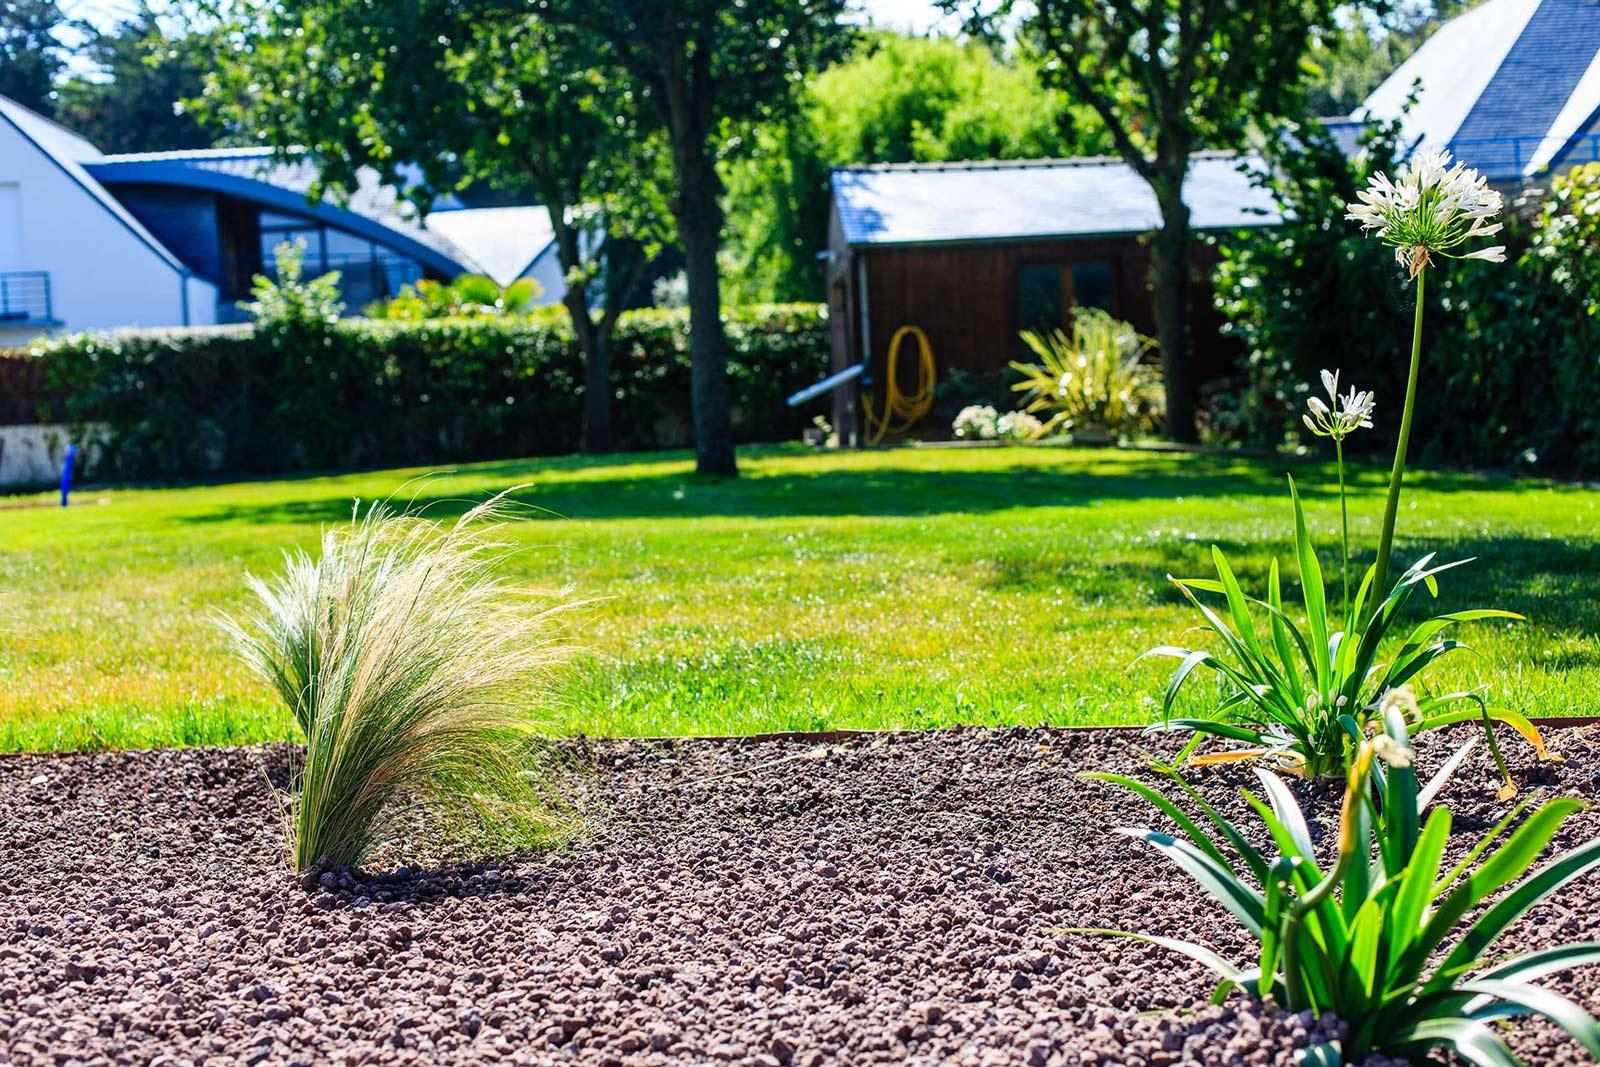 Manu prestations jardins entretien des jardin la baule Guérande, herbignac